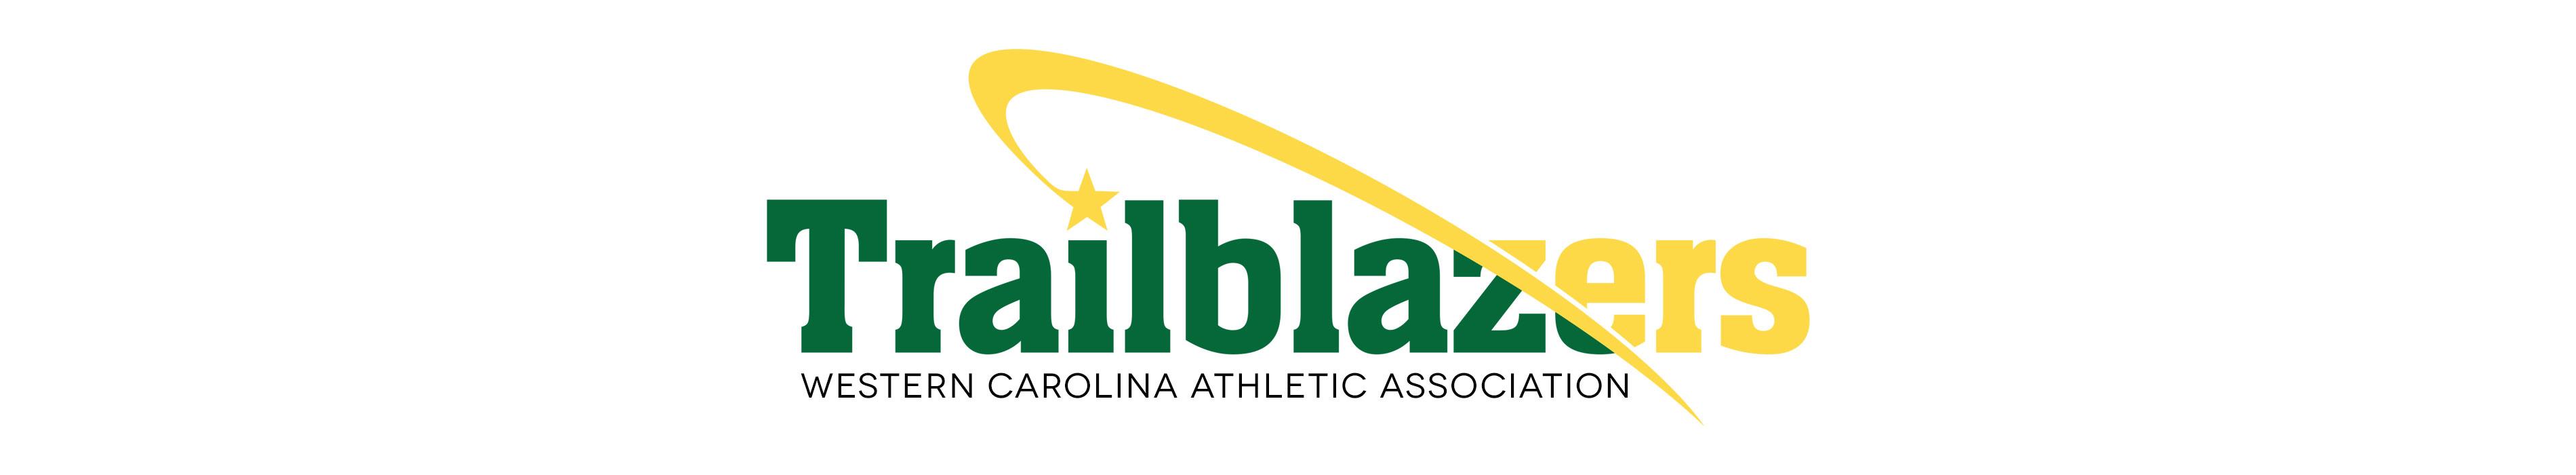 WCAA - Asheville Trailblazers